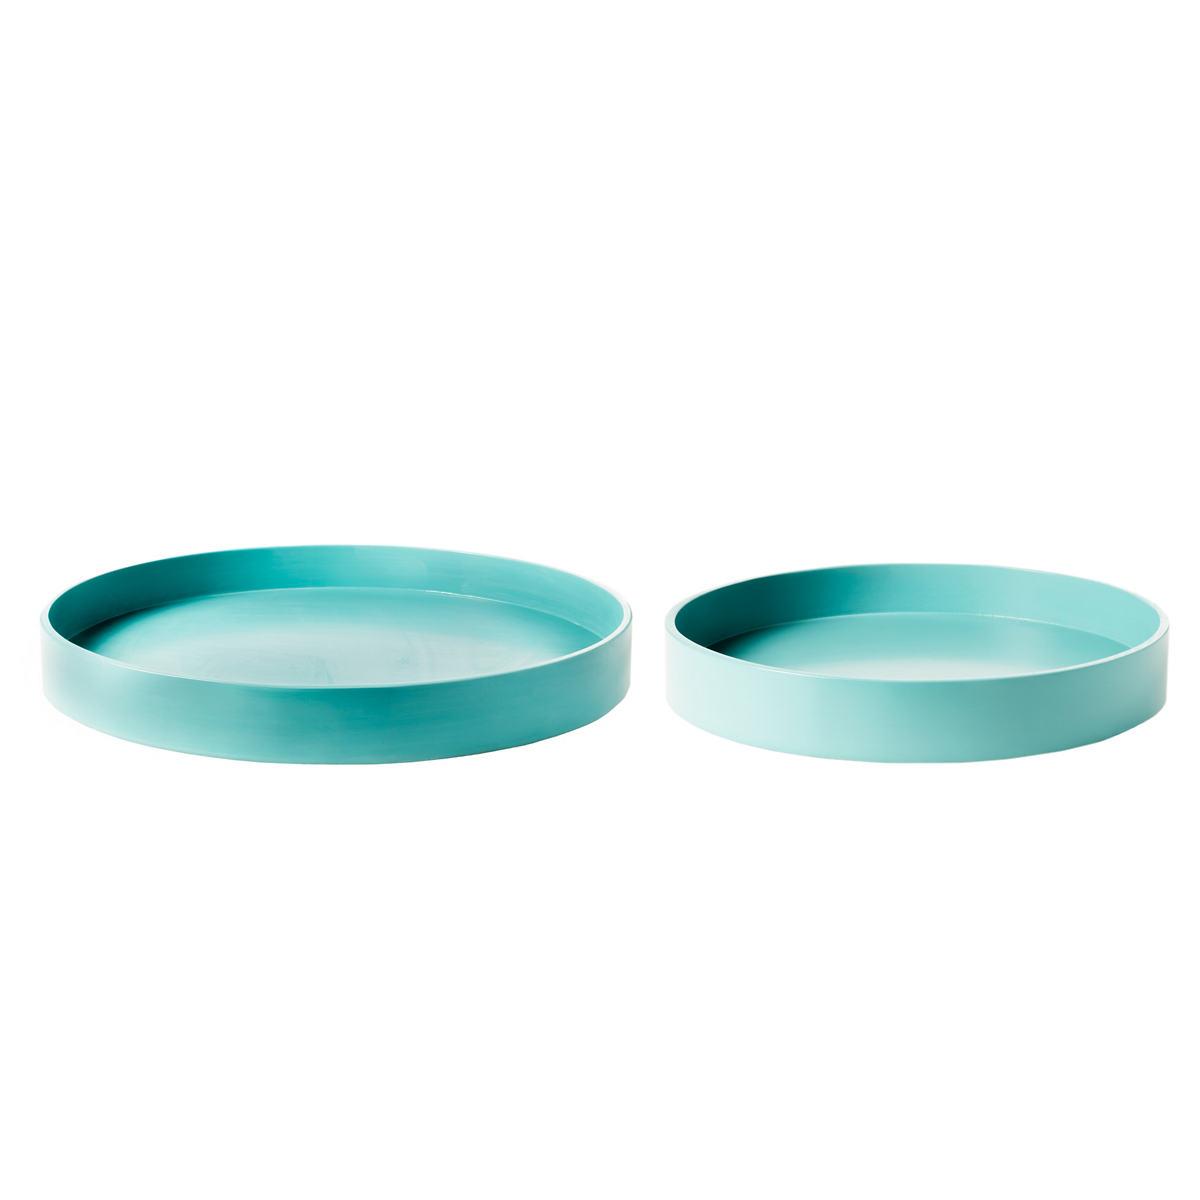 Turquoise Modular Tray